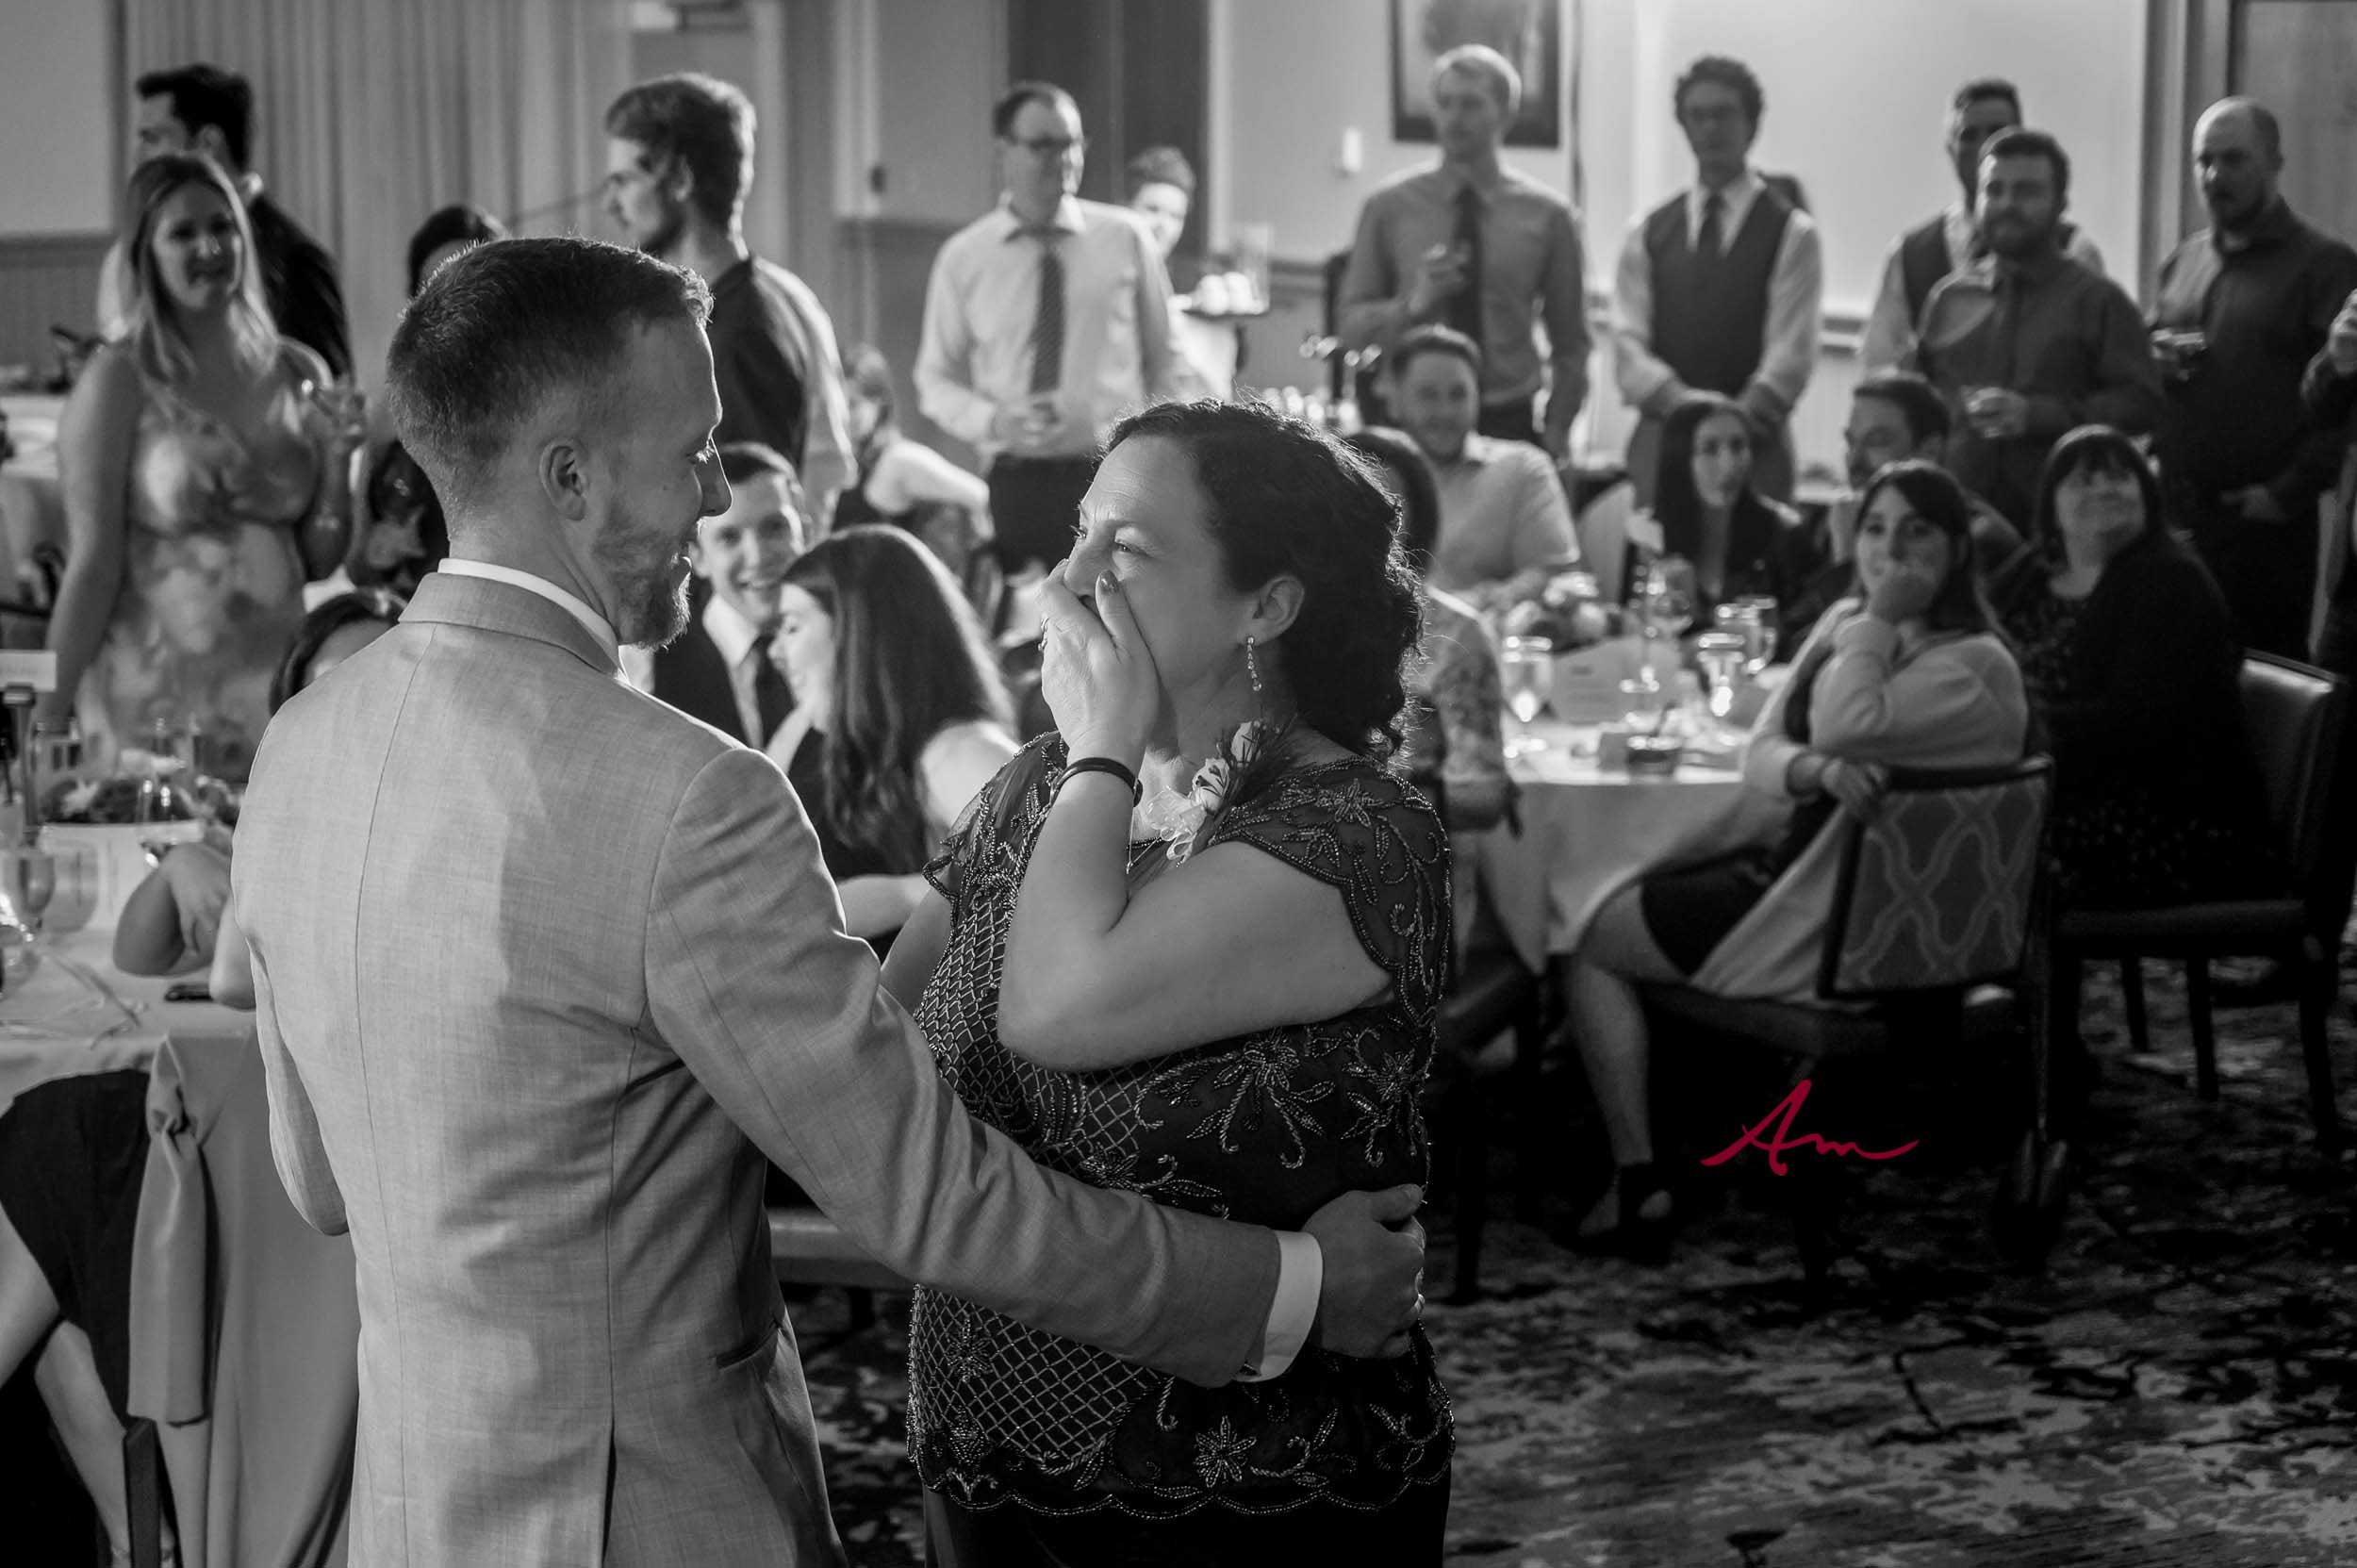 Fox-Harb'r-Wedding-Mother-Groom-Dance.jpg